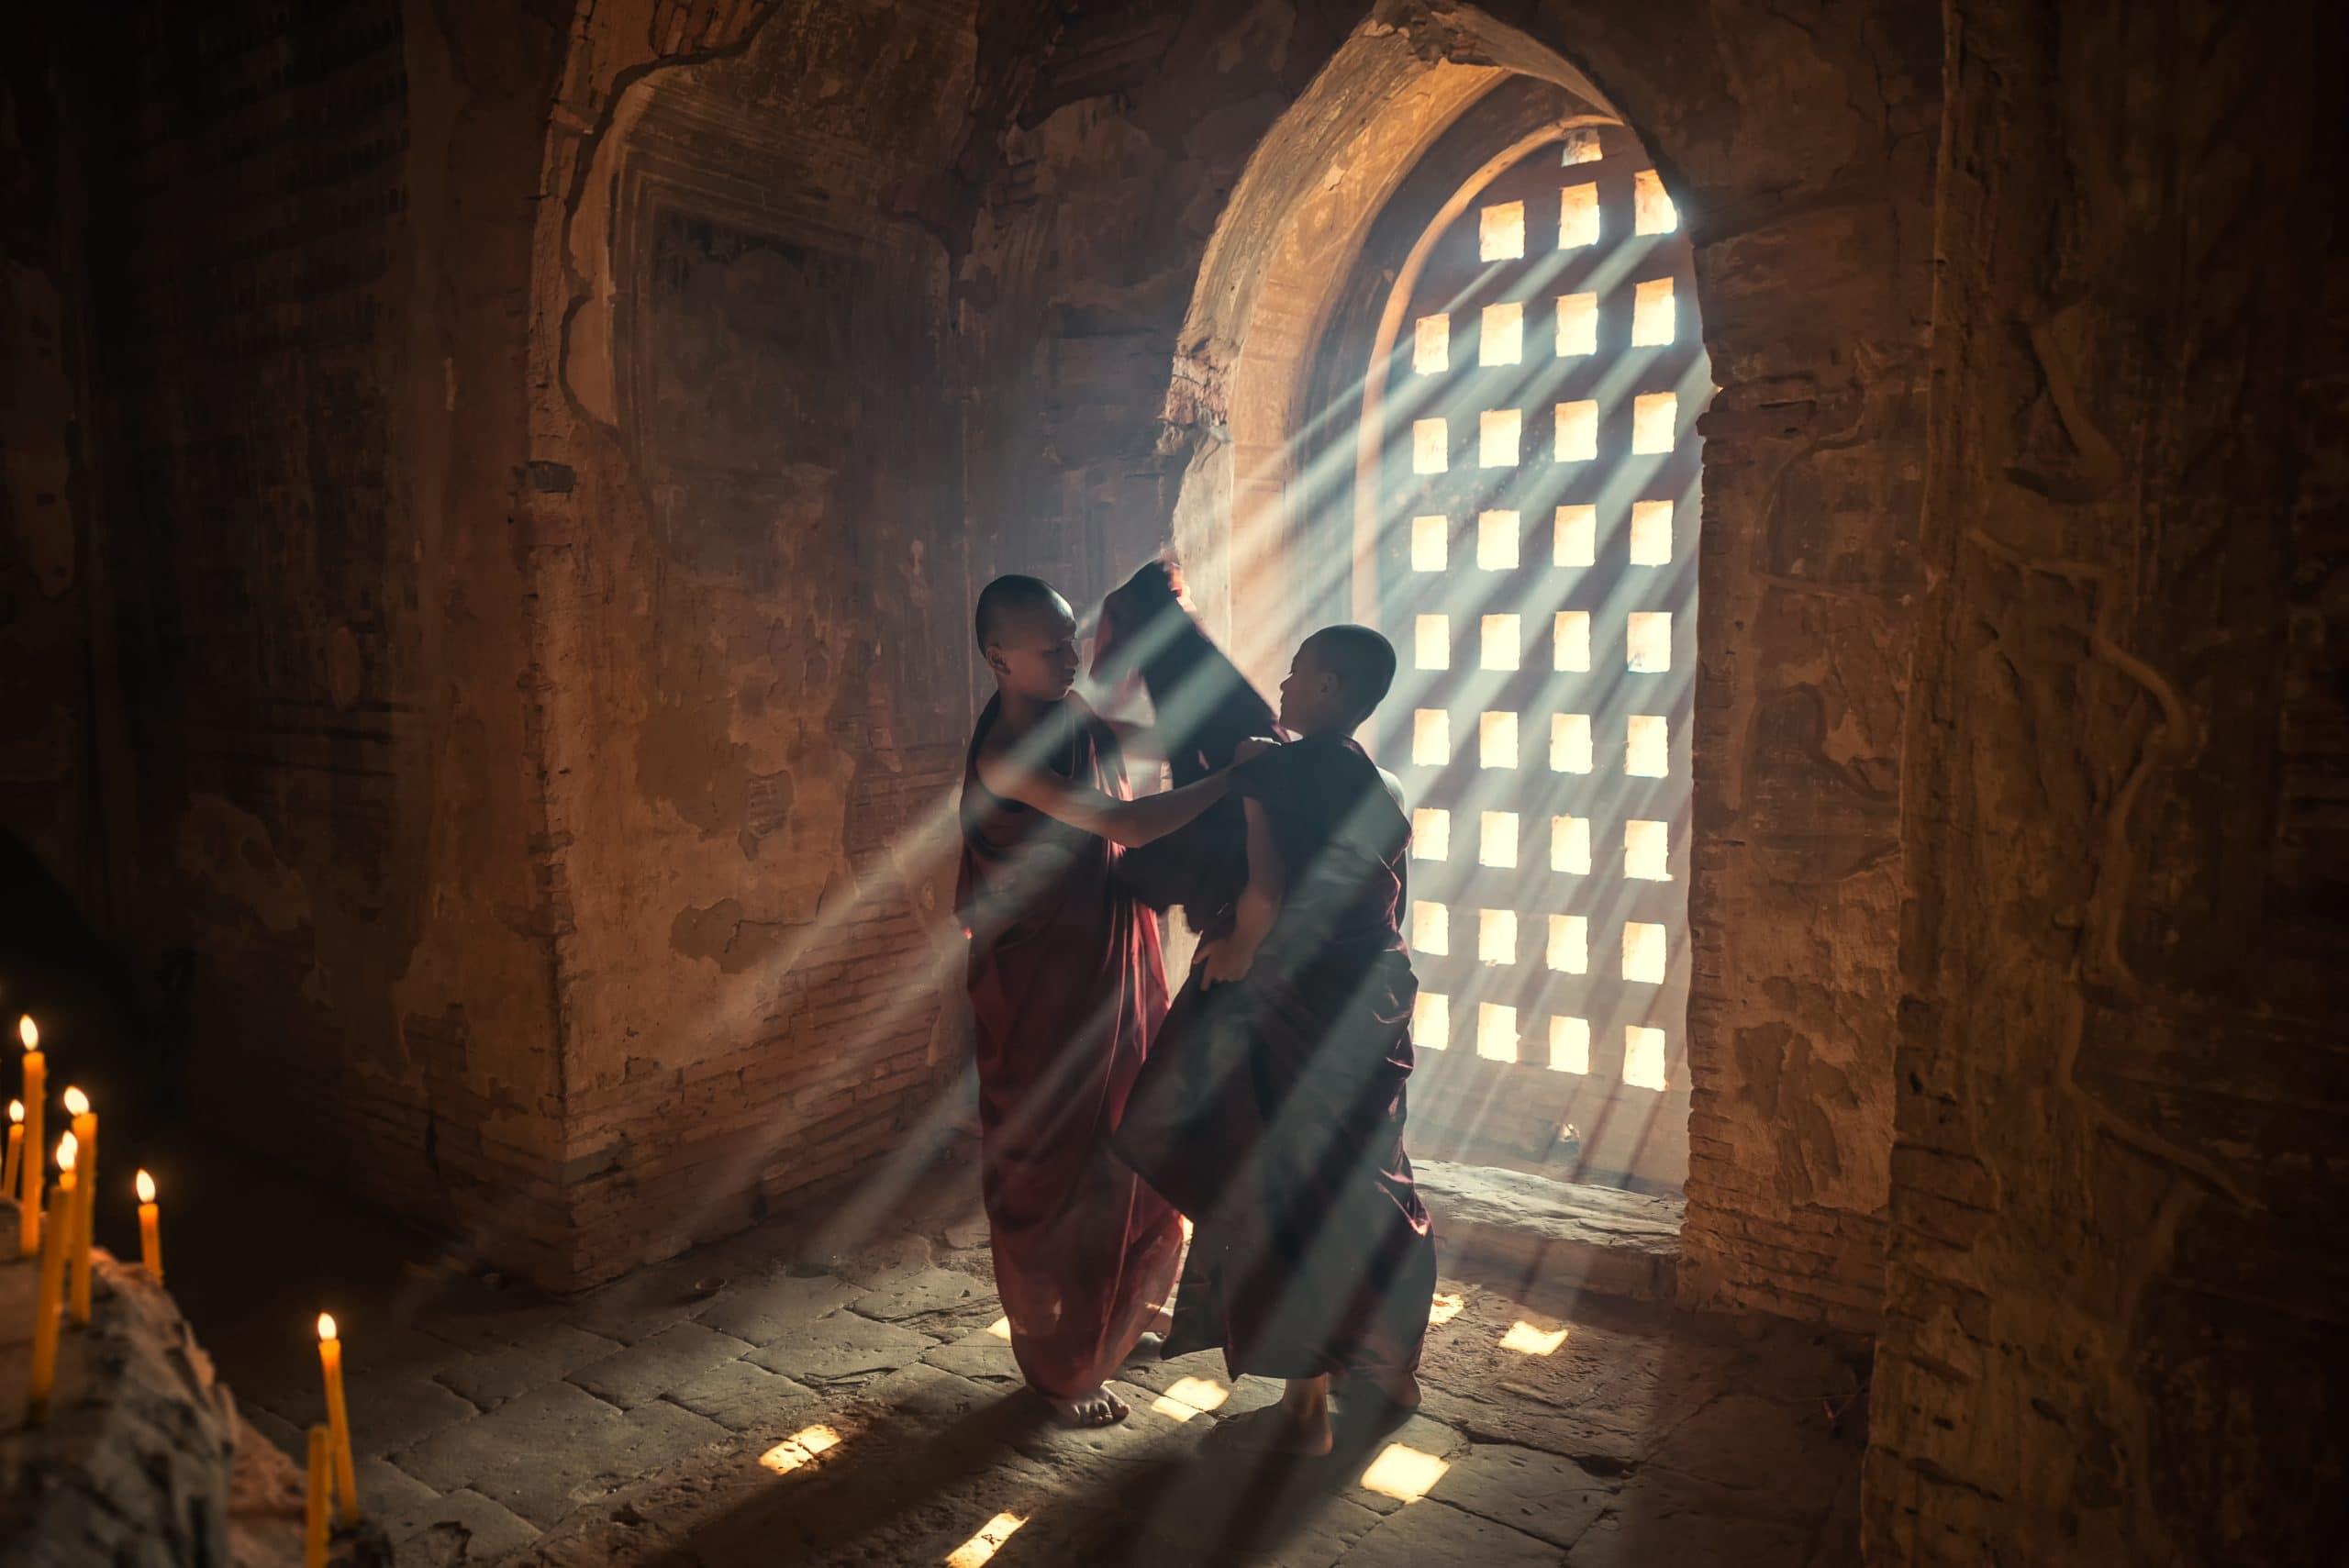 myanmar mönche tempel novizen